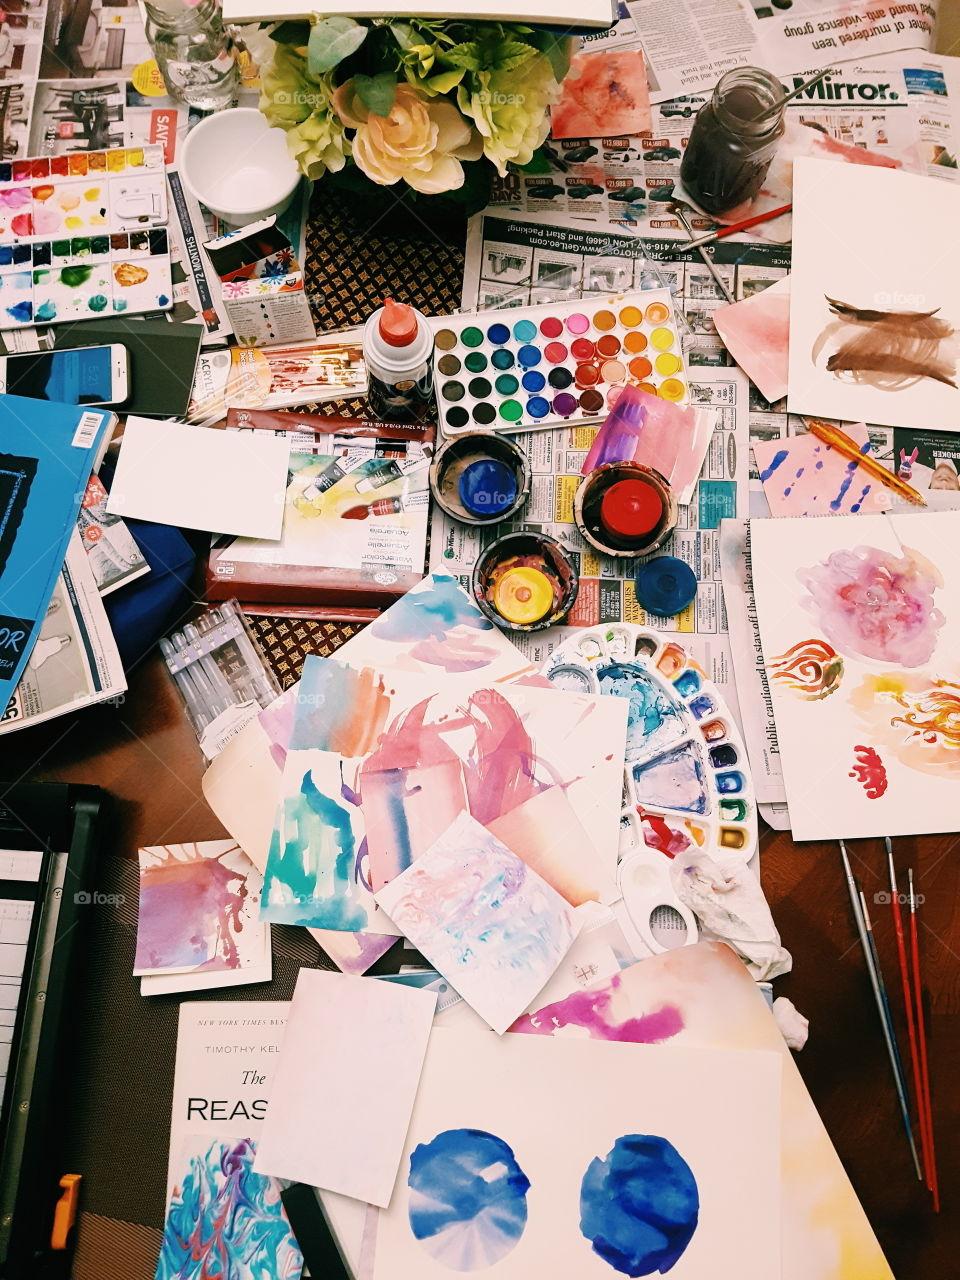 Paper, Creativity, Business, Exhibition, No Person